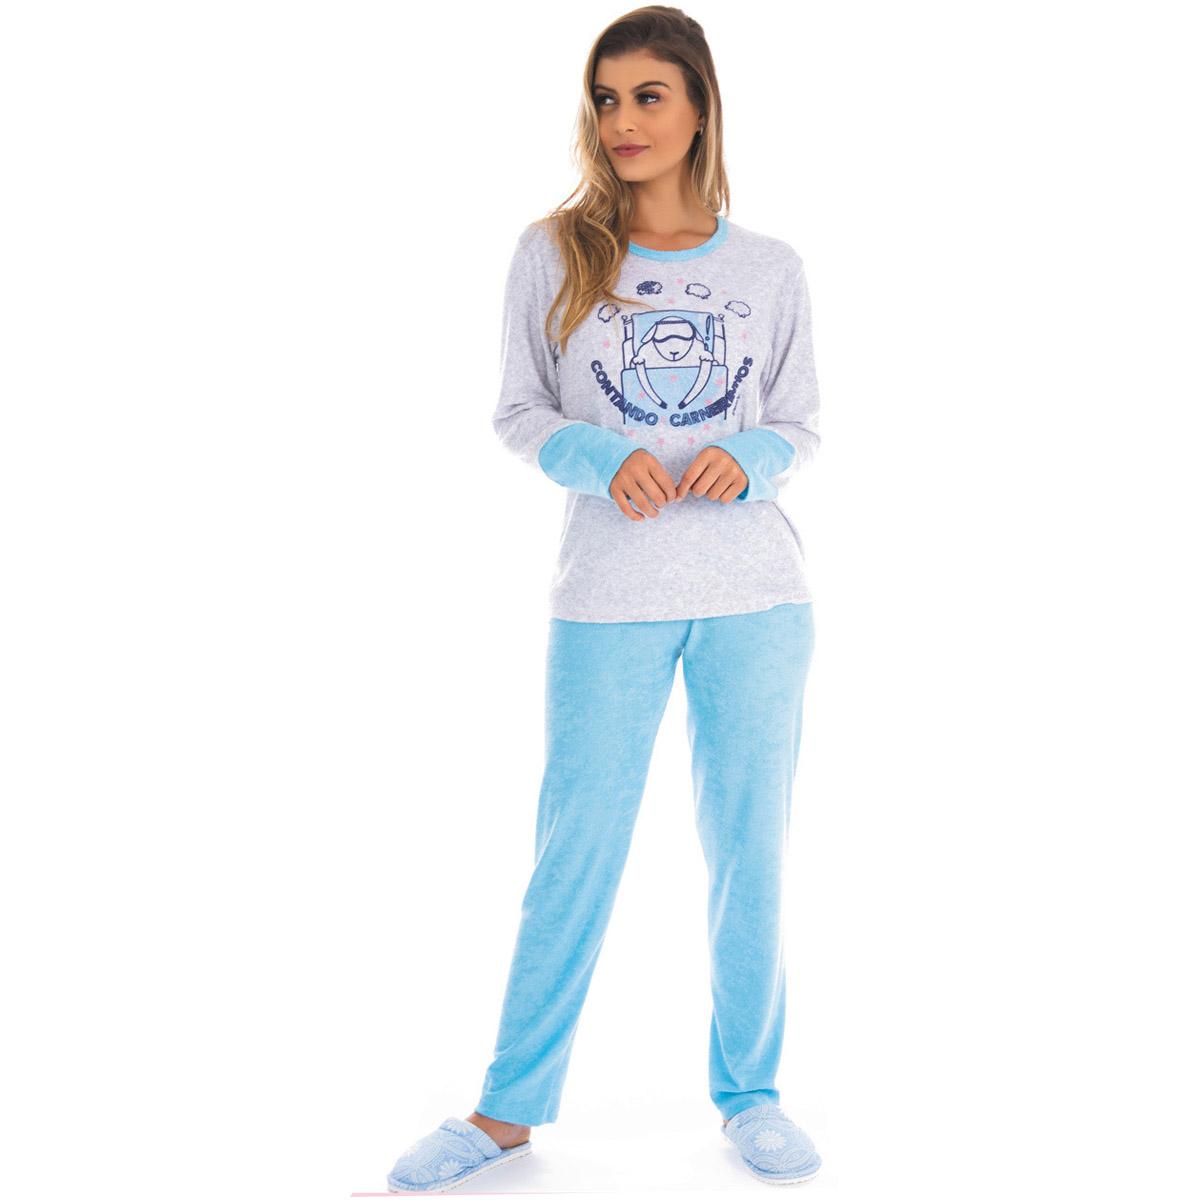 Pijama feminino de inverno plush SOPHIA Victory